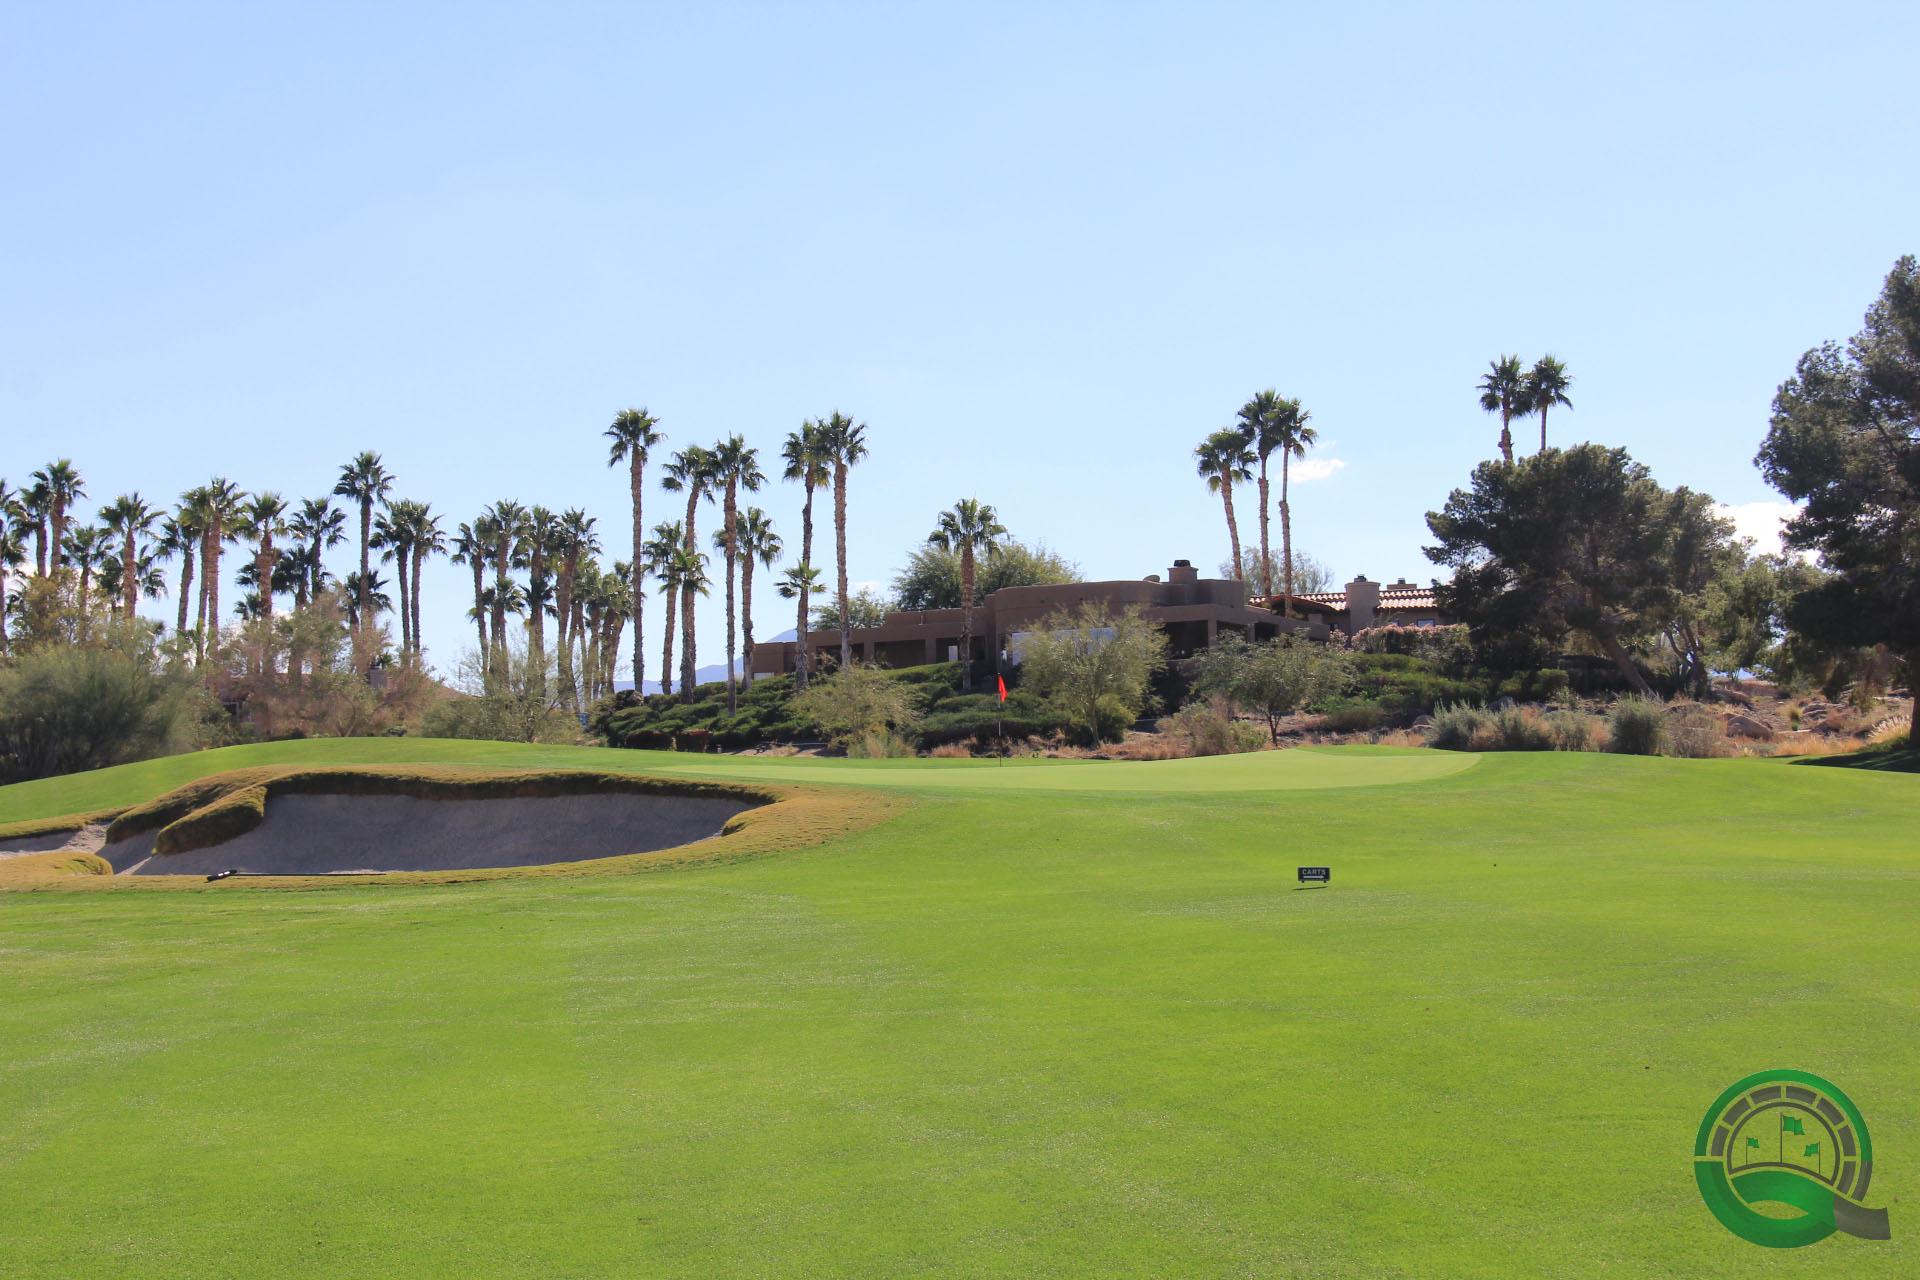 Rams Hill Golf Club Hole 1 Fairway